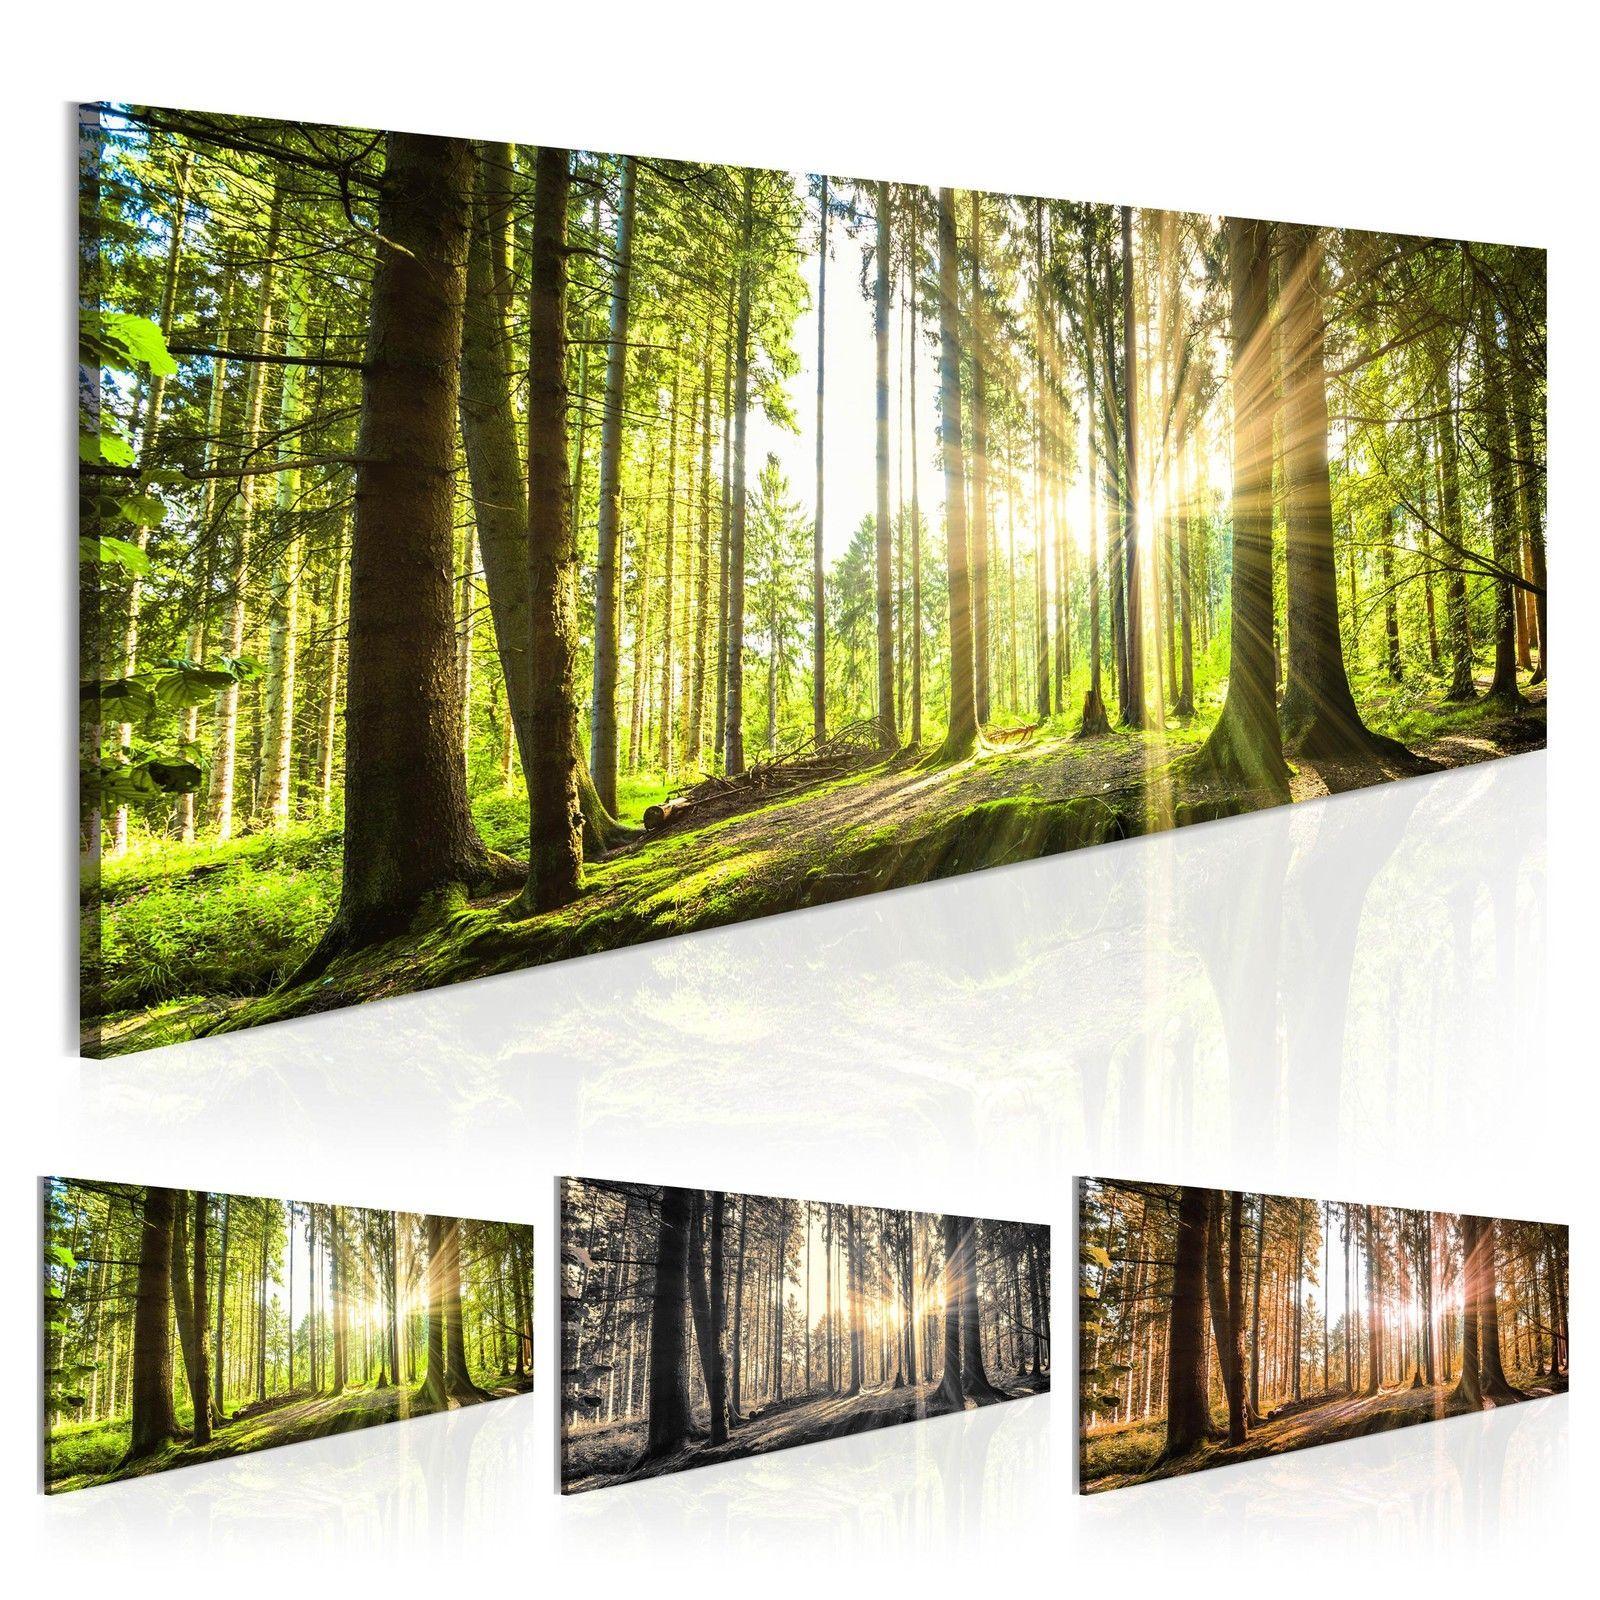 Leinwand Bilder Xxl Fertig Aufgespannt Bild Wald Natur BÄume C B 0077 B B Landschaftsposter Waldbilder Landschaftskunst